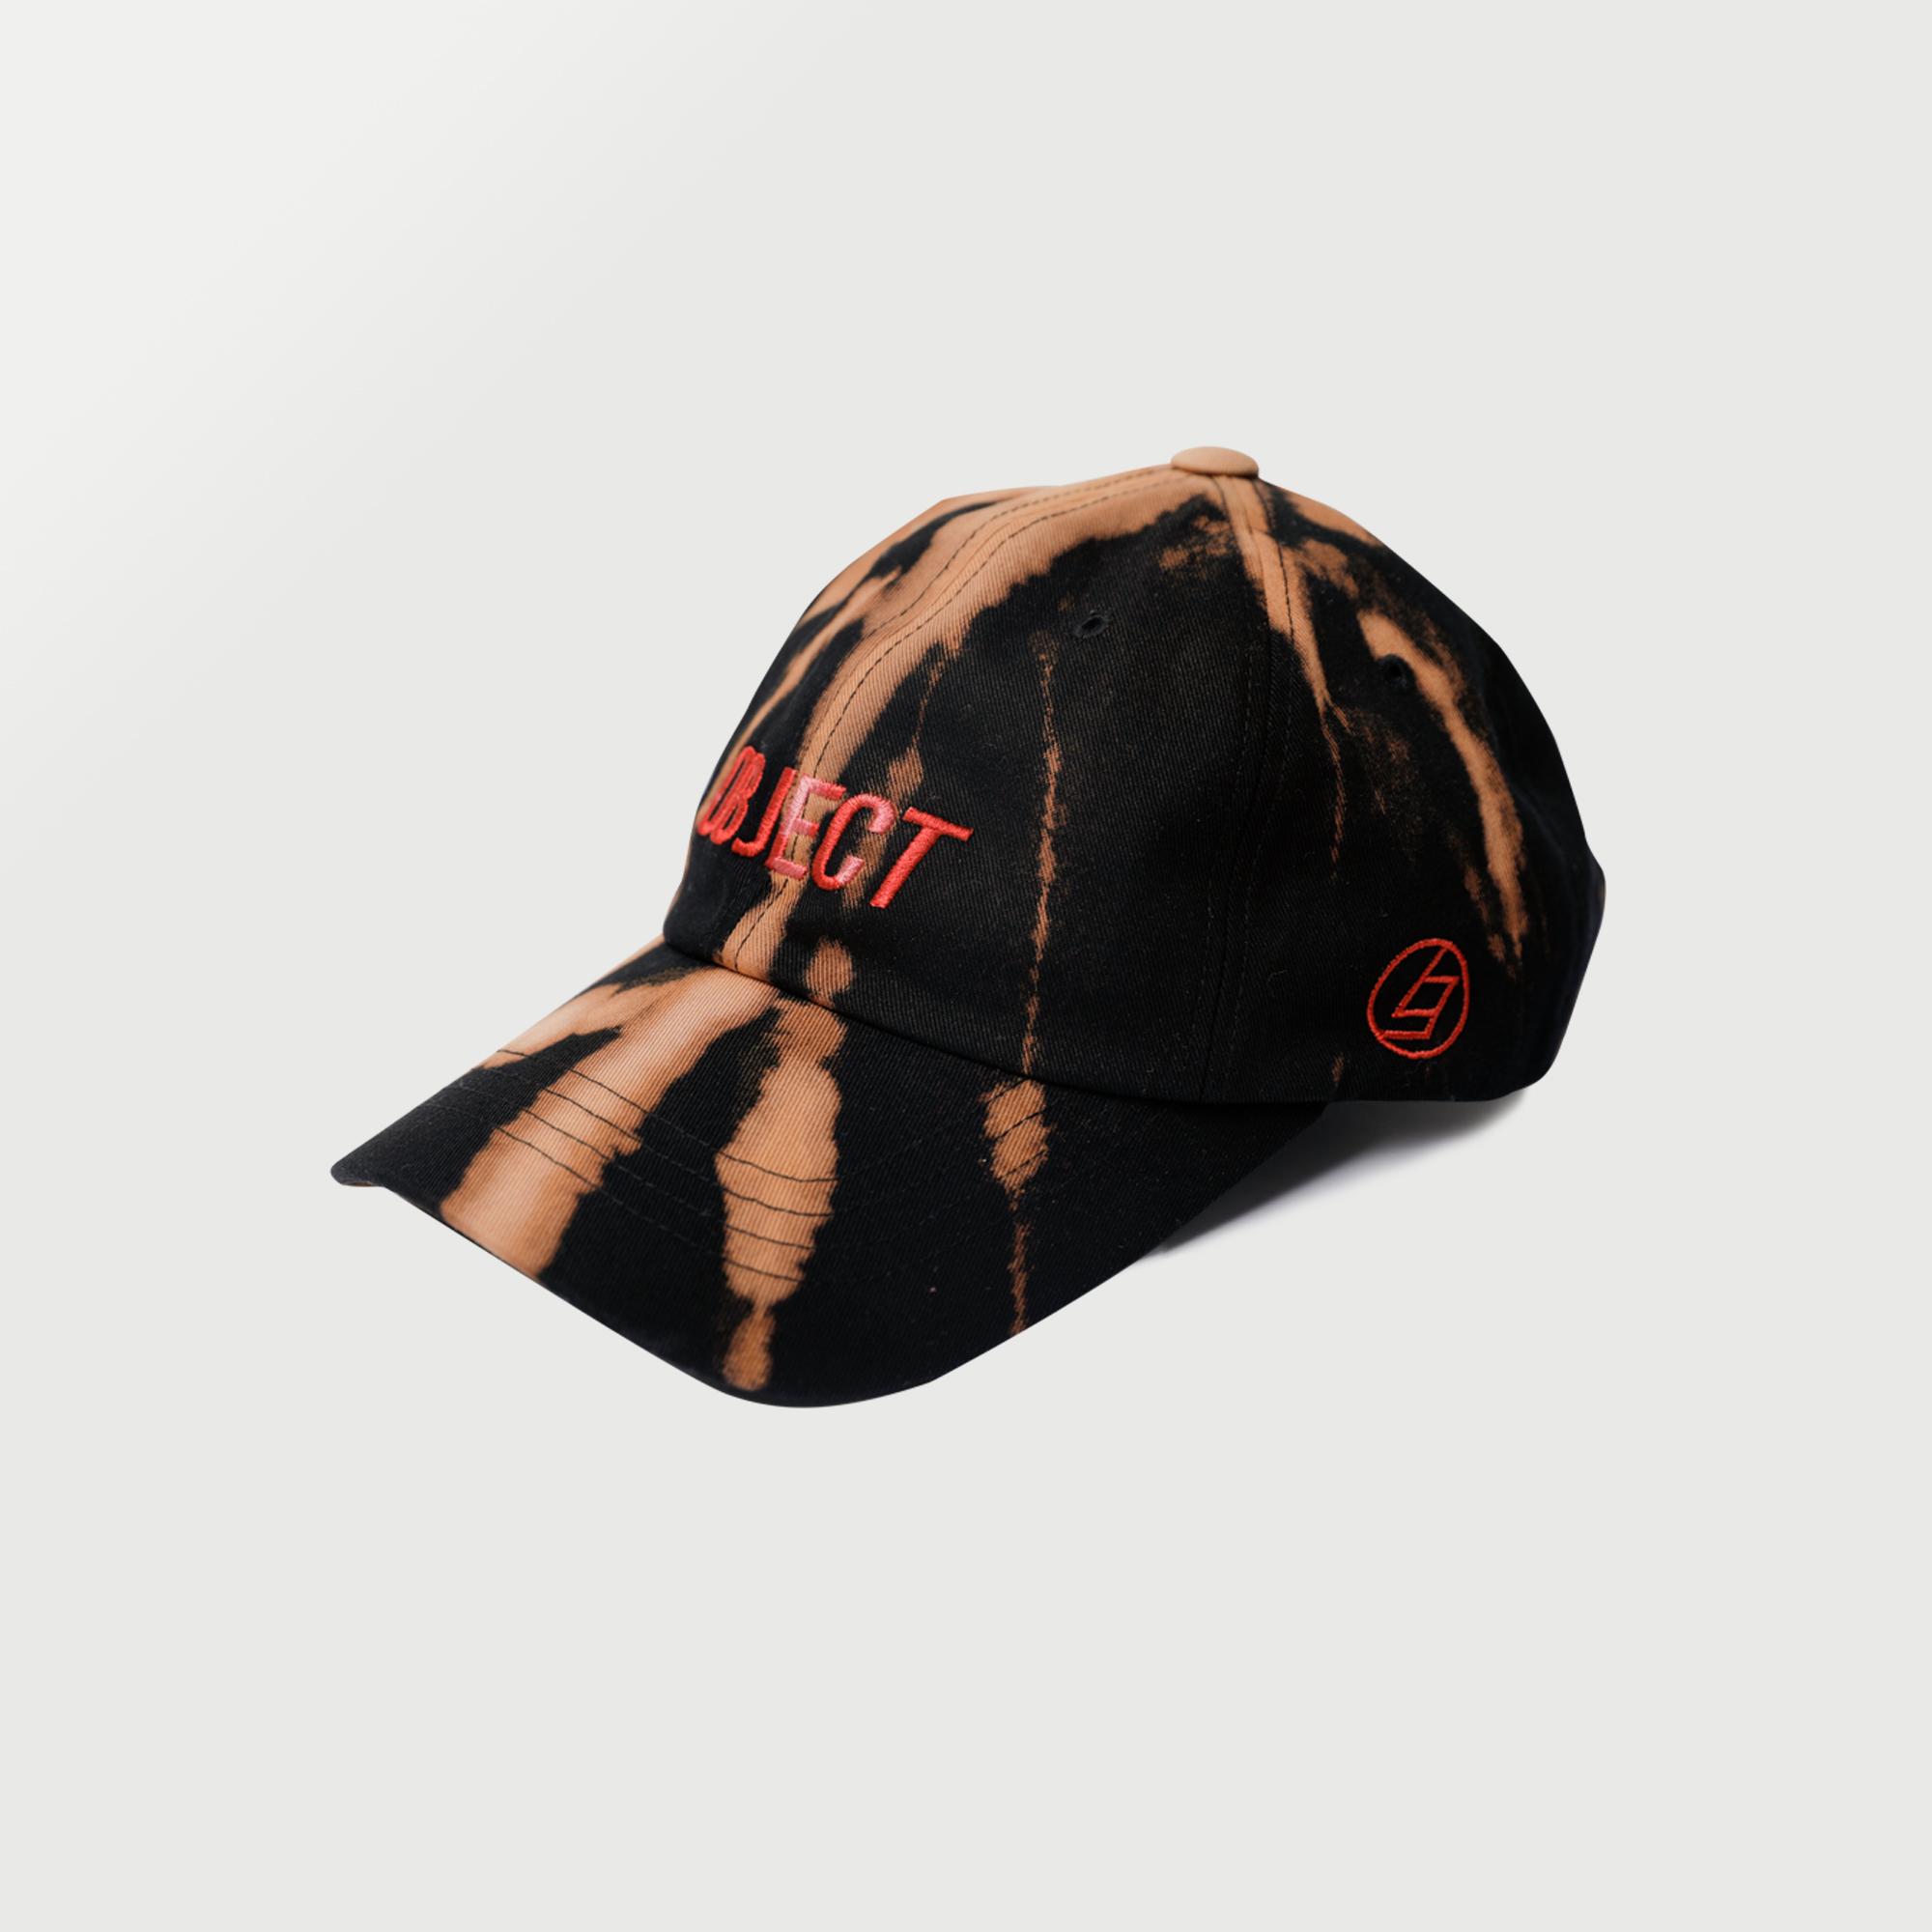 BLEACH OBJECT LOGO CAP (BLACK_RED)